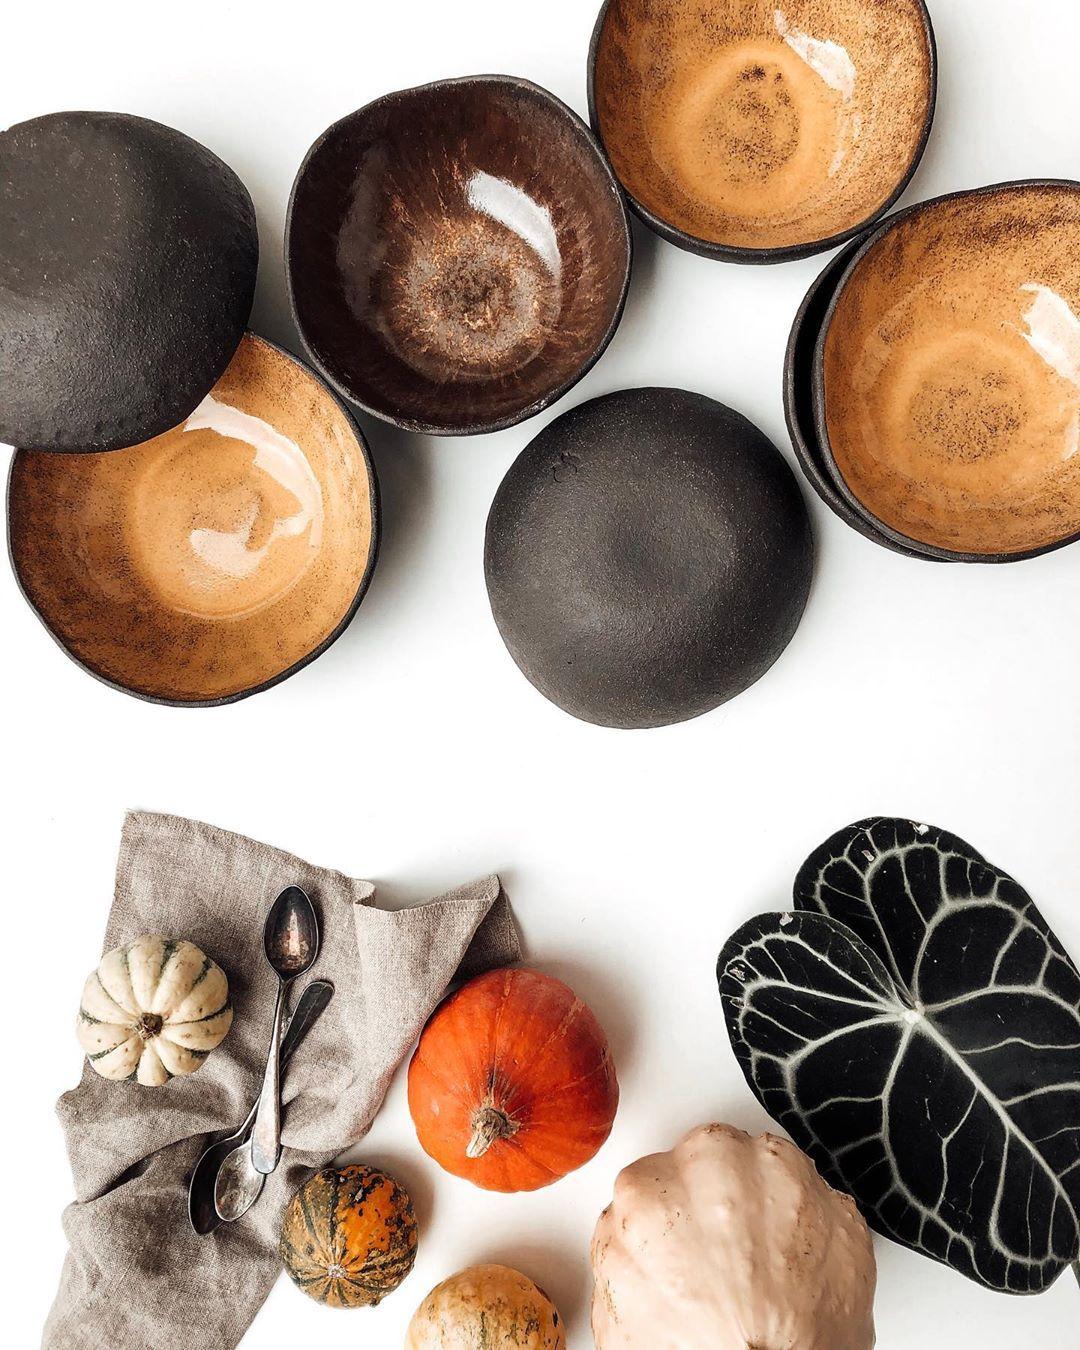 Tedenski jedilnik juhic lahko spremljate na naših storijih  . . #artofvisuals #autumn #community #foragebyfolk #food #foodie #fallvibes #eeeeeats #flatlay #global_hotshotz #ig_captures #igdaily #folkgood #lunch #kinfolk #kampadanes #minimal #minimalism #onthetable #sociality #still_life_gallery #soup #plantbased #thehappynow #thatsdarling #veggies #vegan #vsco #visualsoflife #visitkranjTedenski jedilnik juhic lahko spremljate na naših storijih ...